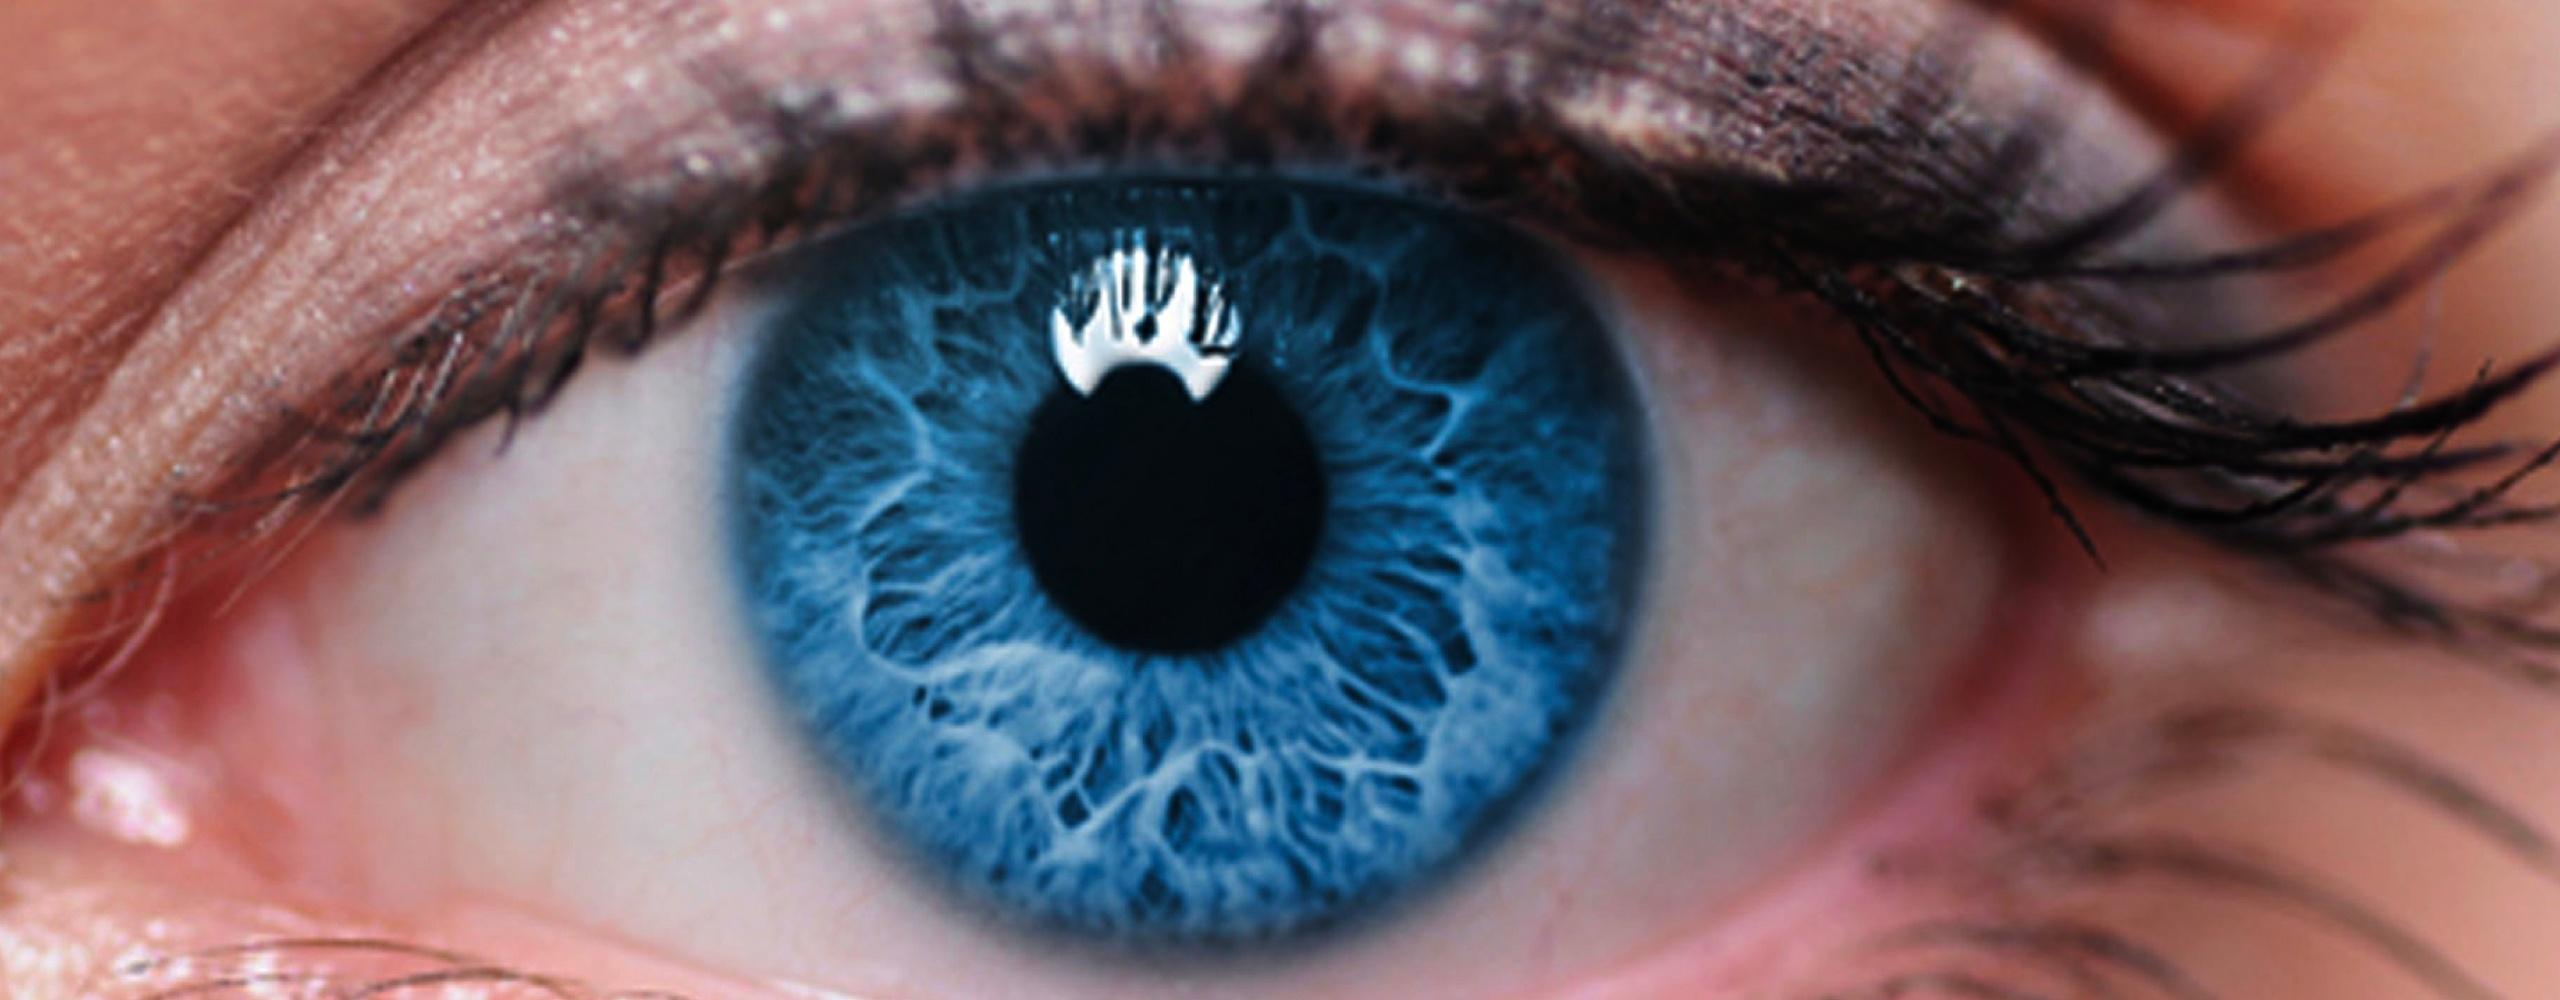 Tecan: Bringing a life science brand into focus